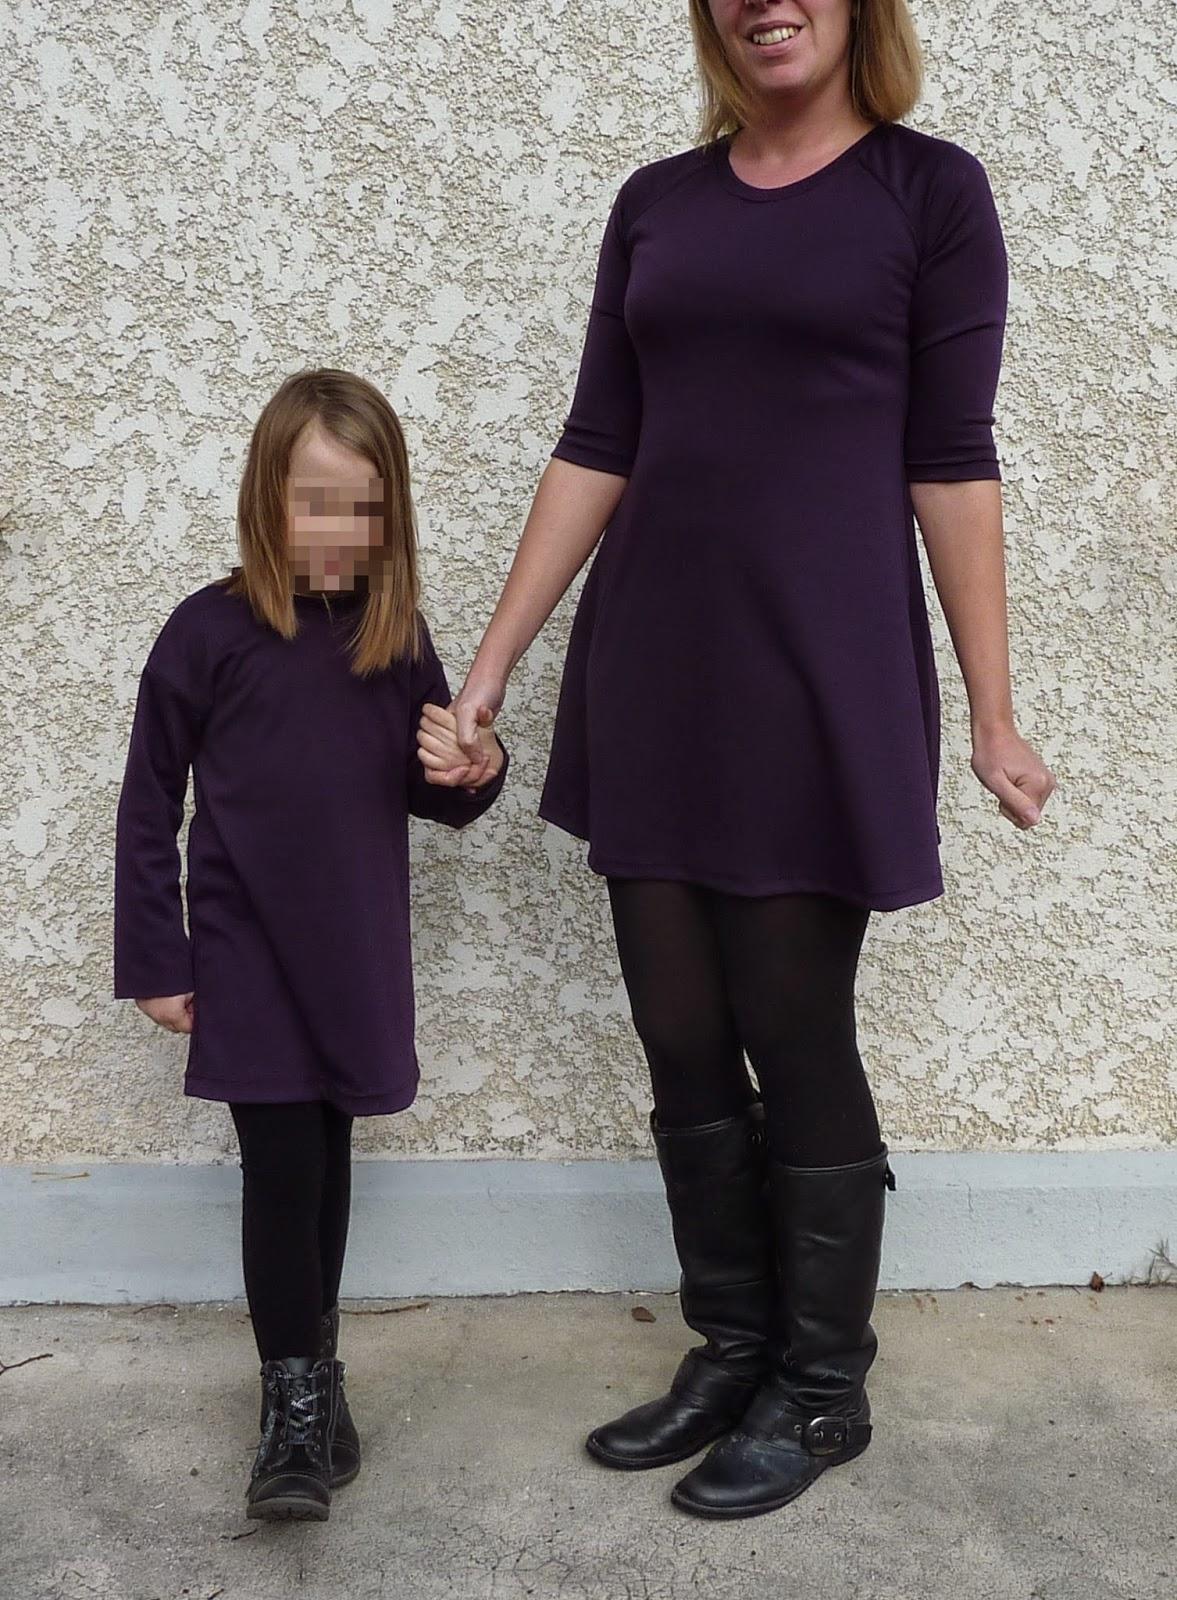 La famille cr ative duo de robes m re fille - Robe mere fille ...